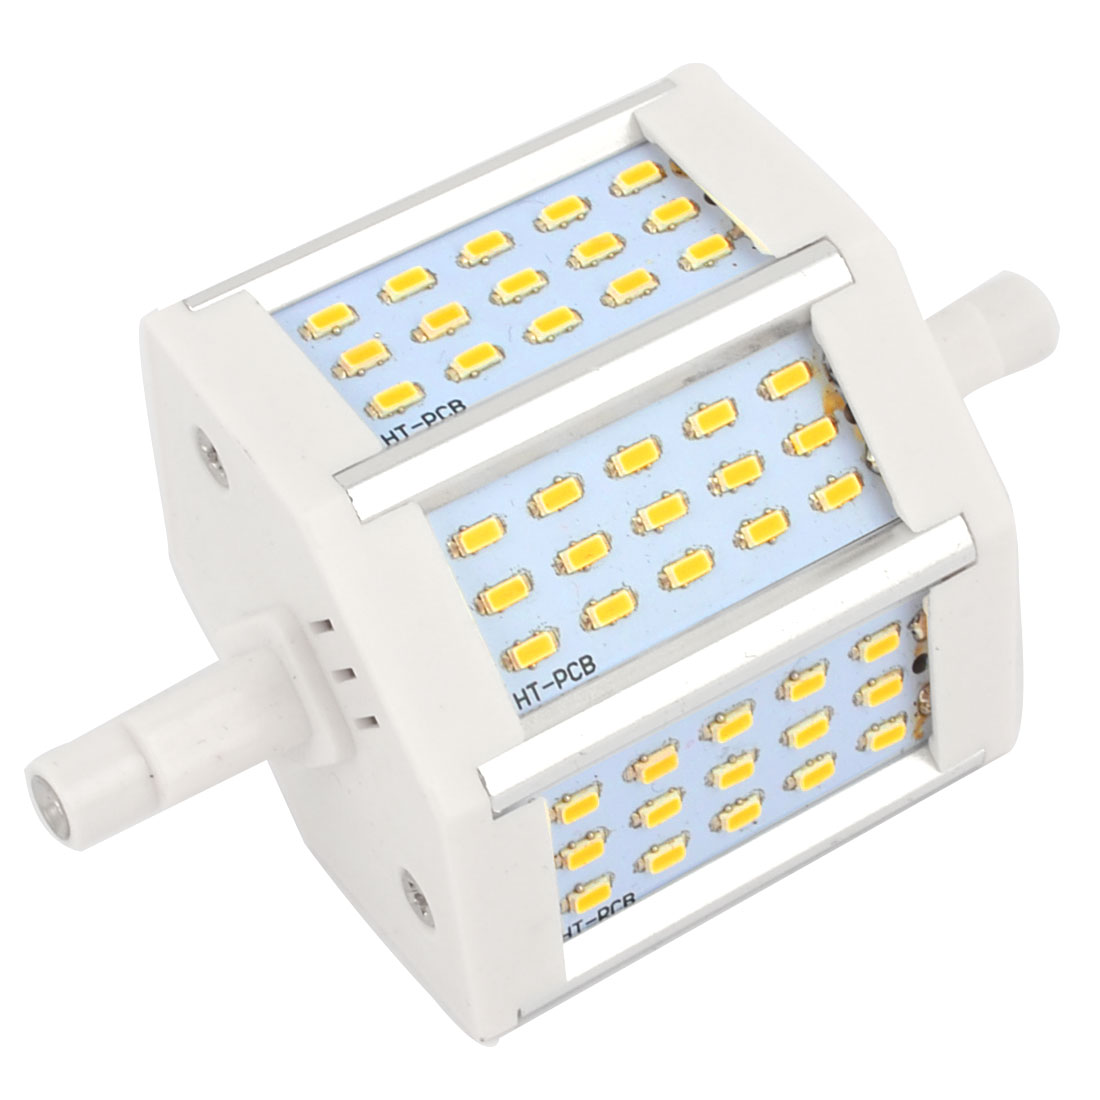 R7S AC85-365V 660LM 45 LEDs SMD 3014 Warm White LED Corn Light Bulb